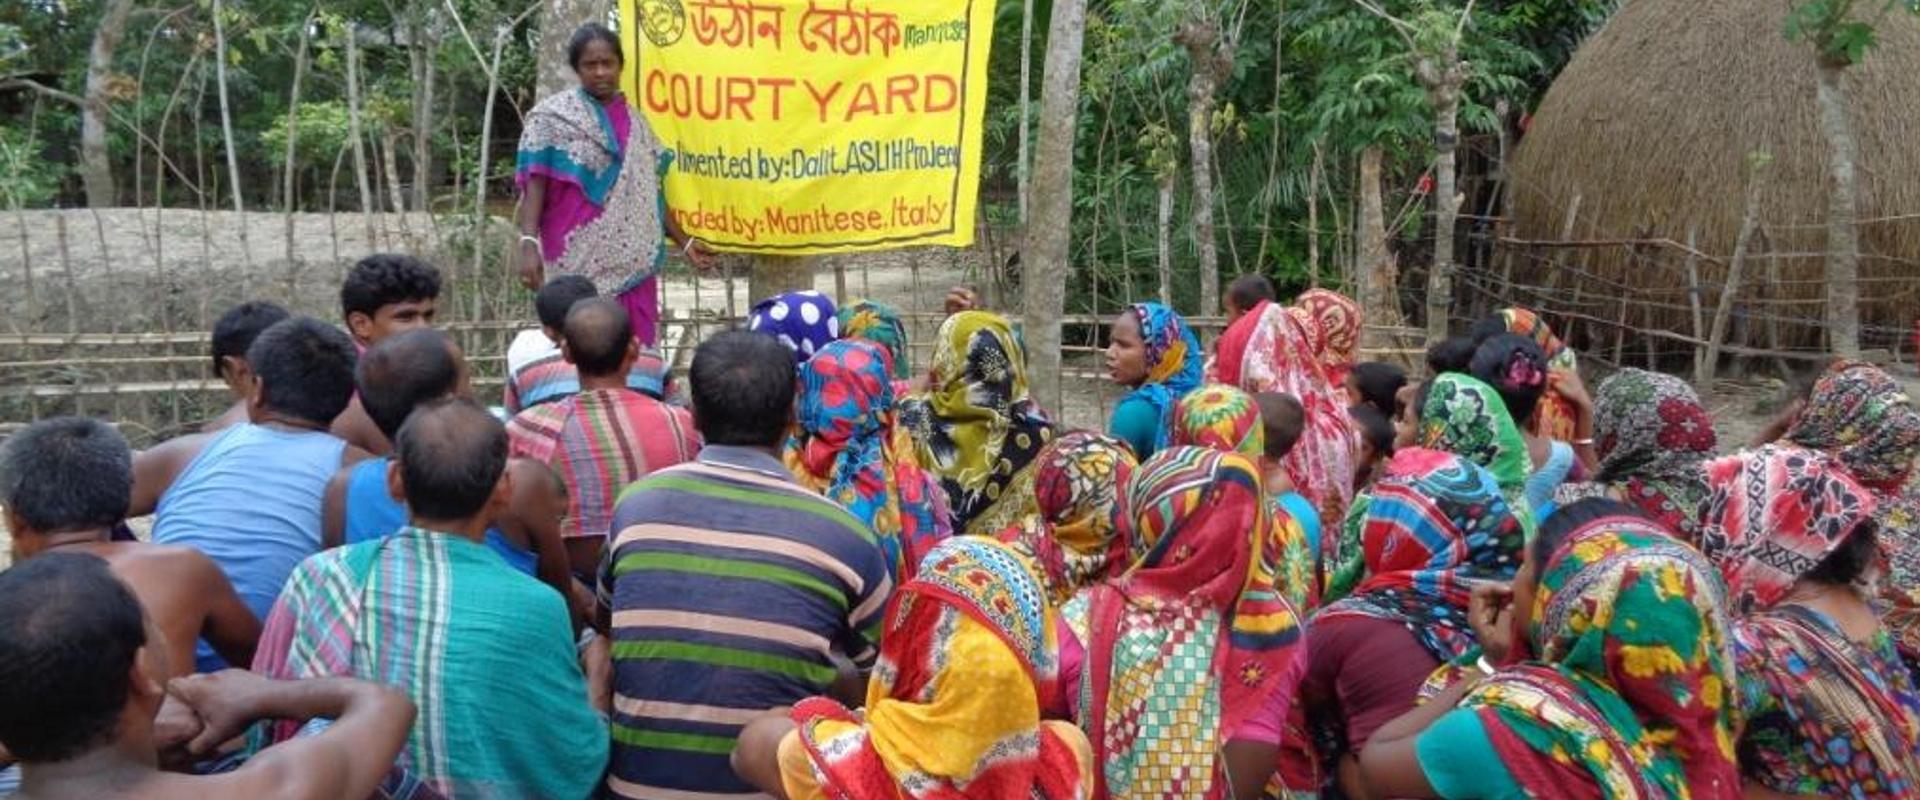 villaggio_bangladesh_mani tese_2017